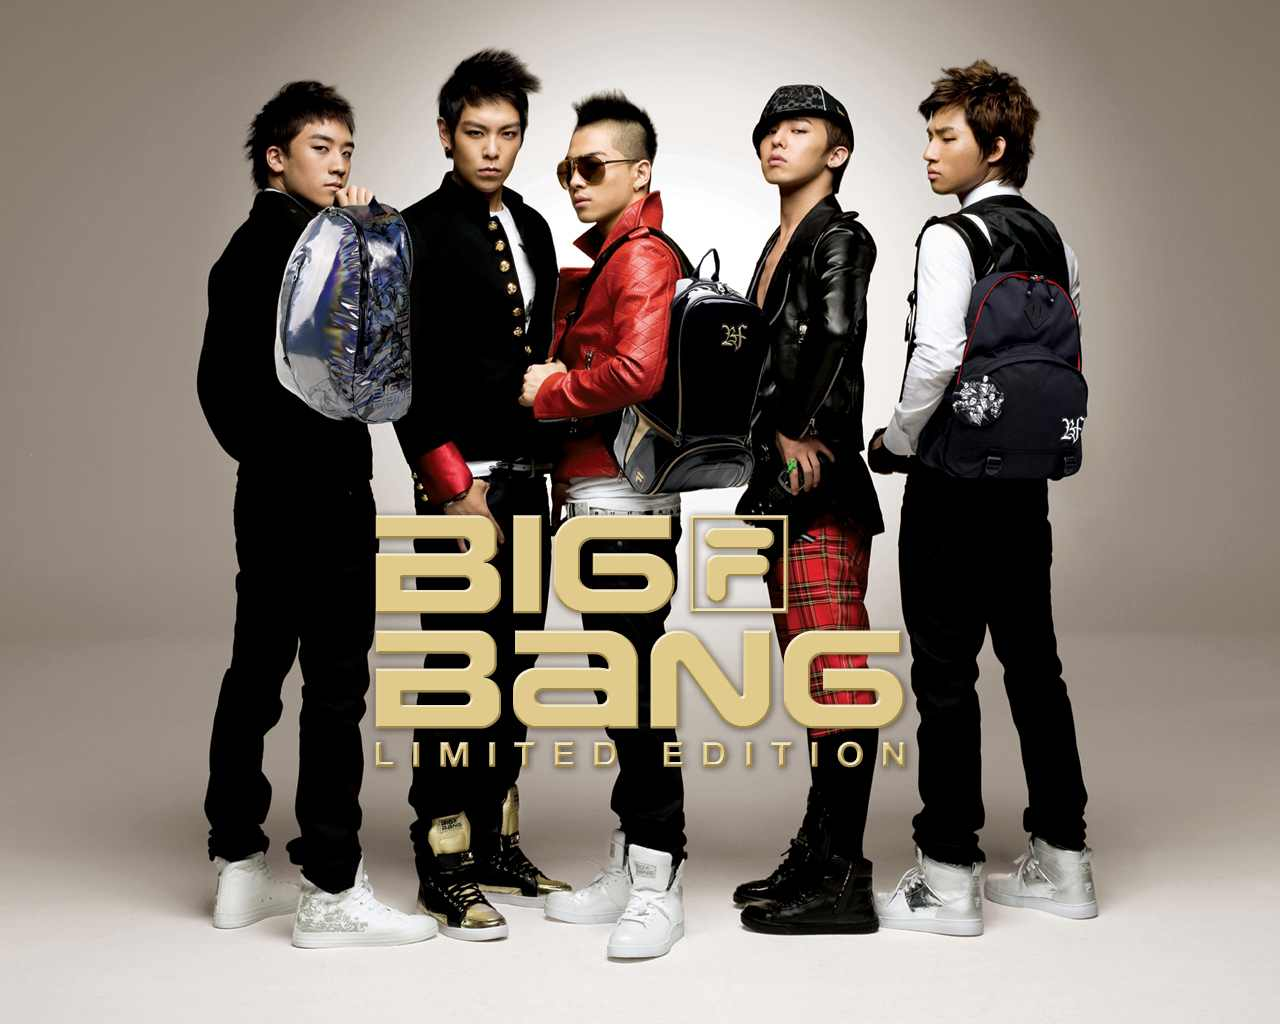 Lagu Terbaru Big Bang Intellignos Big Data Analytics Consulting 1280 X 1024 Jpeg 78kb Boy Band Terbaik Big Bang B2st 2pm Infinite